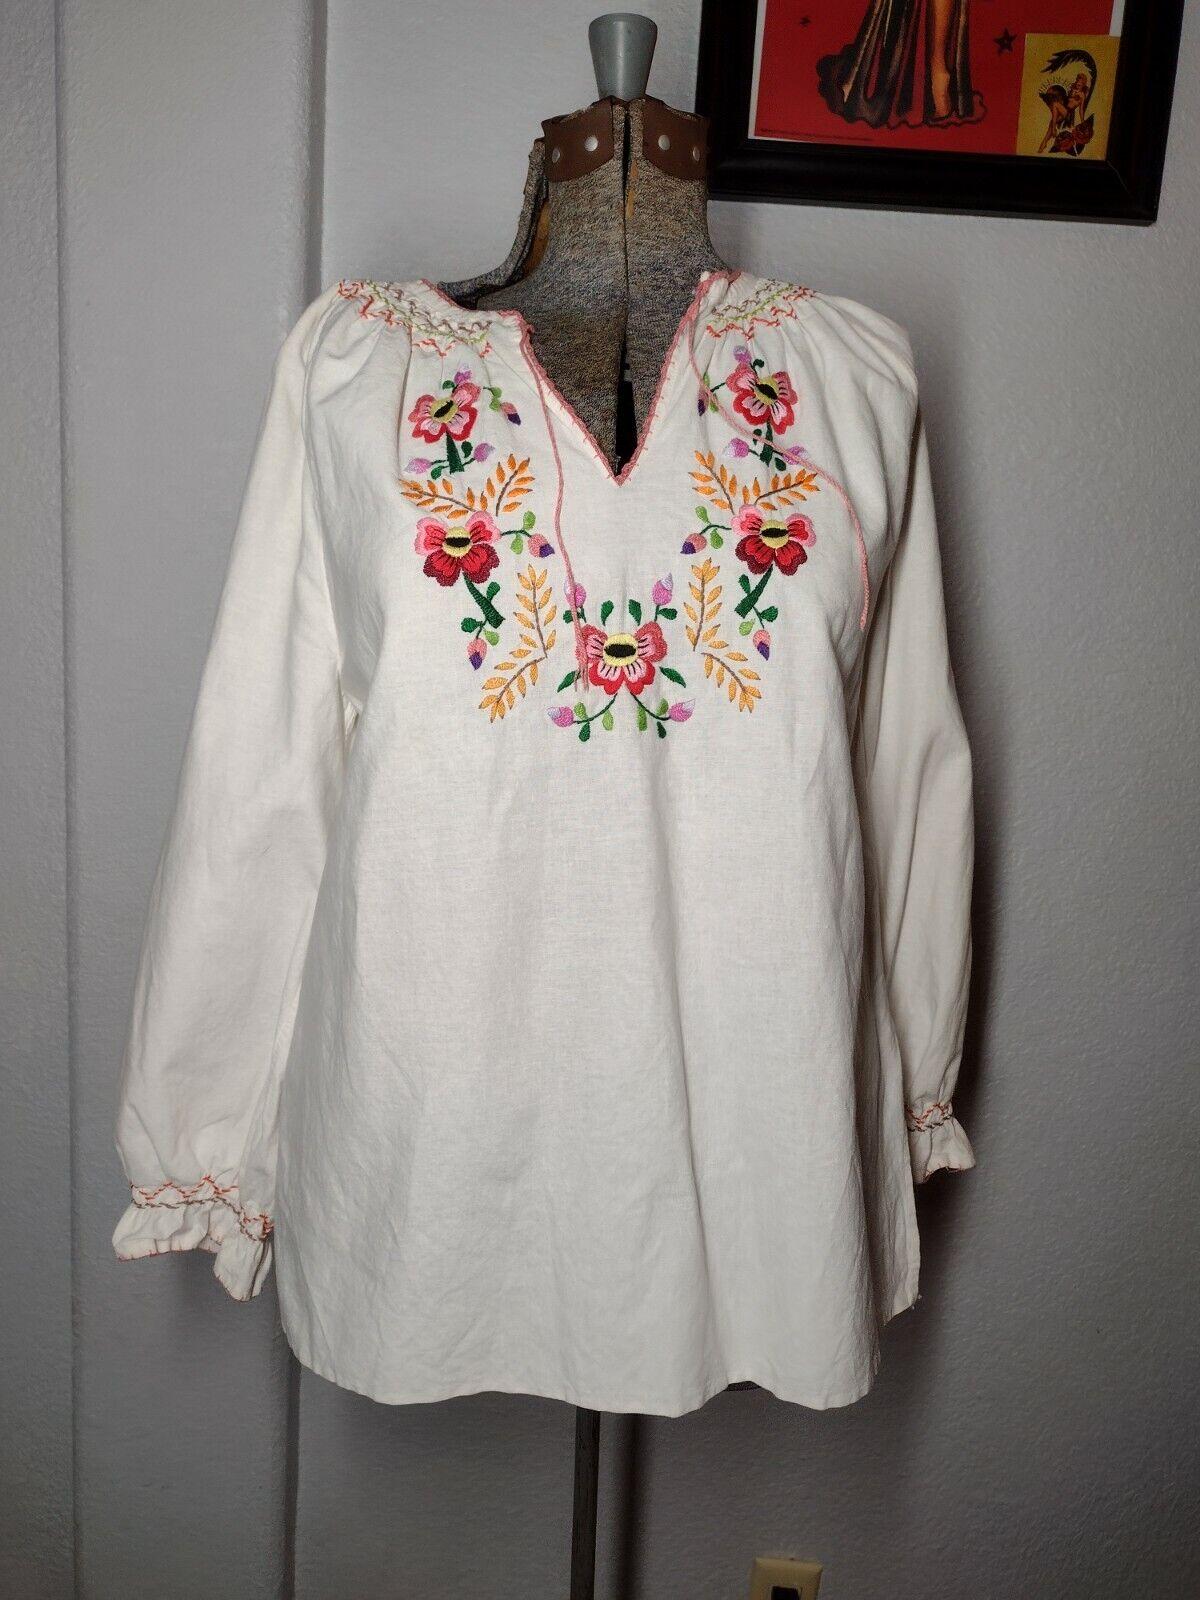 vintage hungarian blouse - image 1